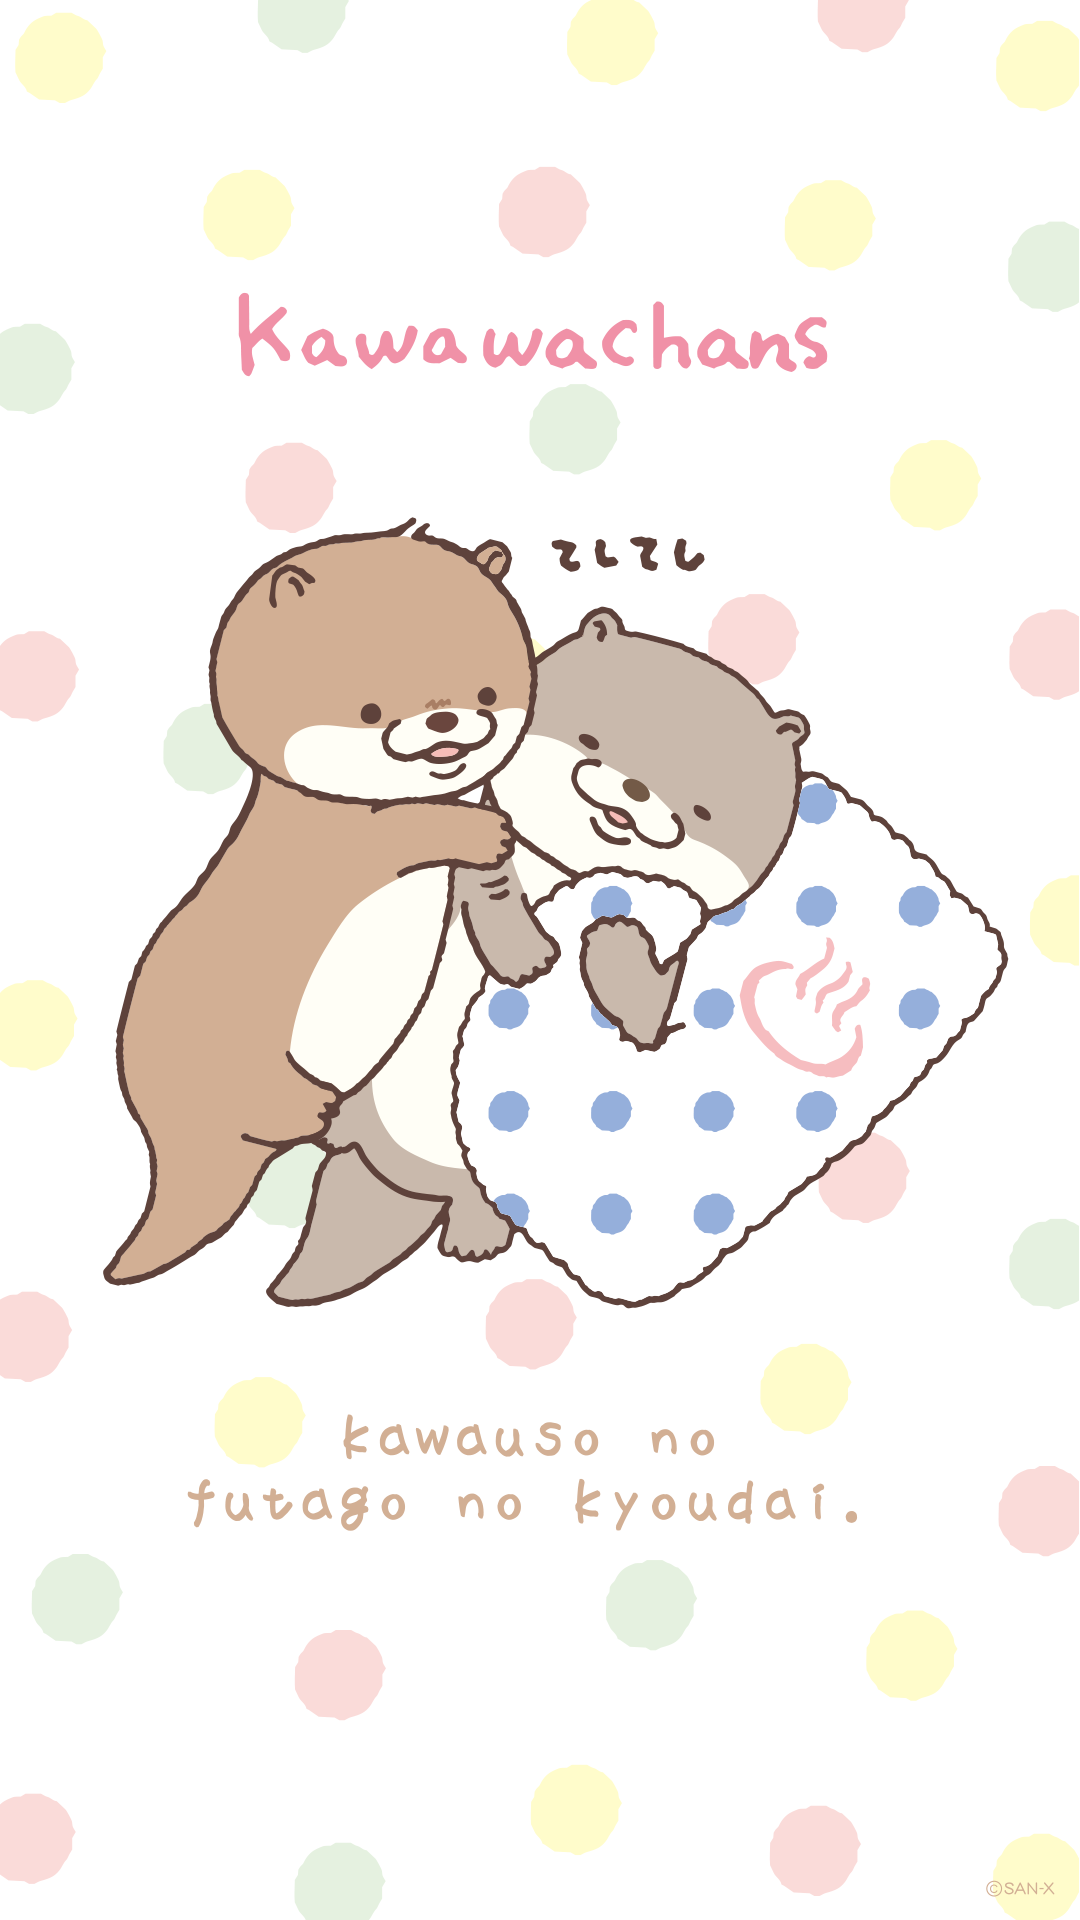 Kawaii San Xネット カワウソ イラスト カワイイアート 壁紙 かわいい